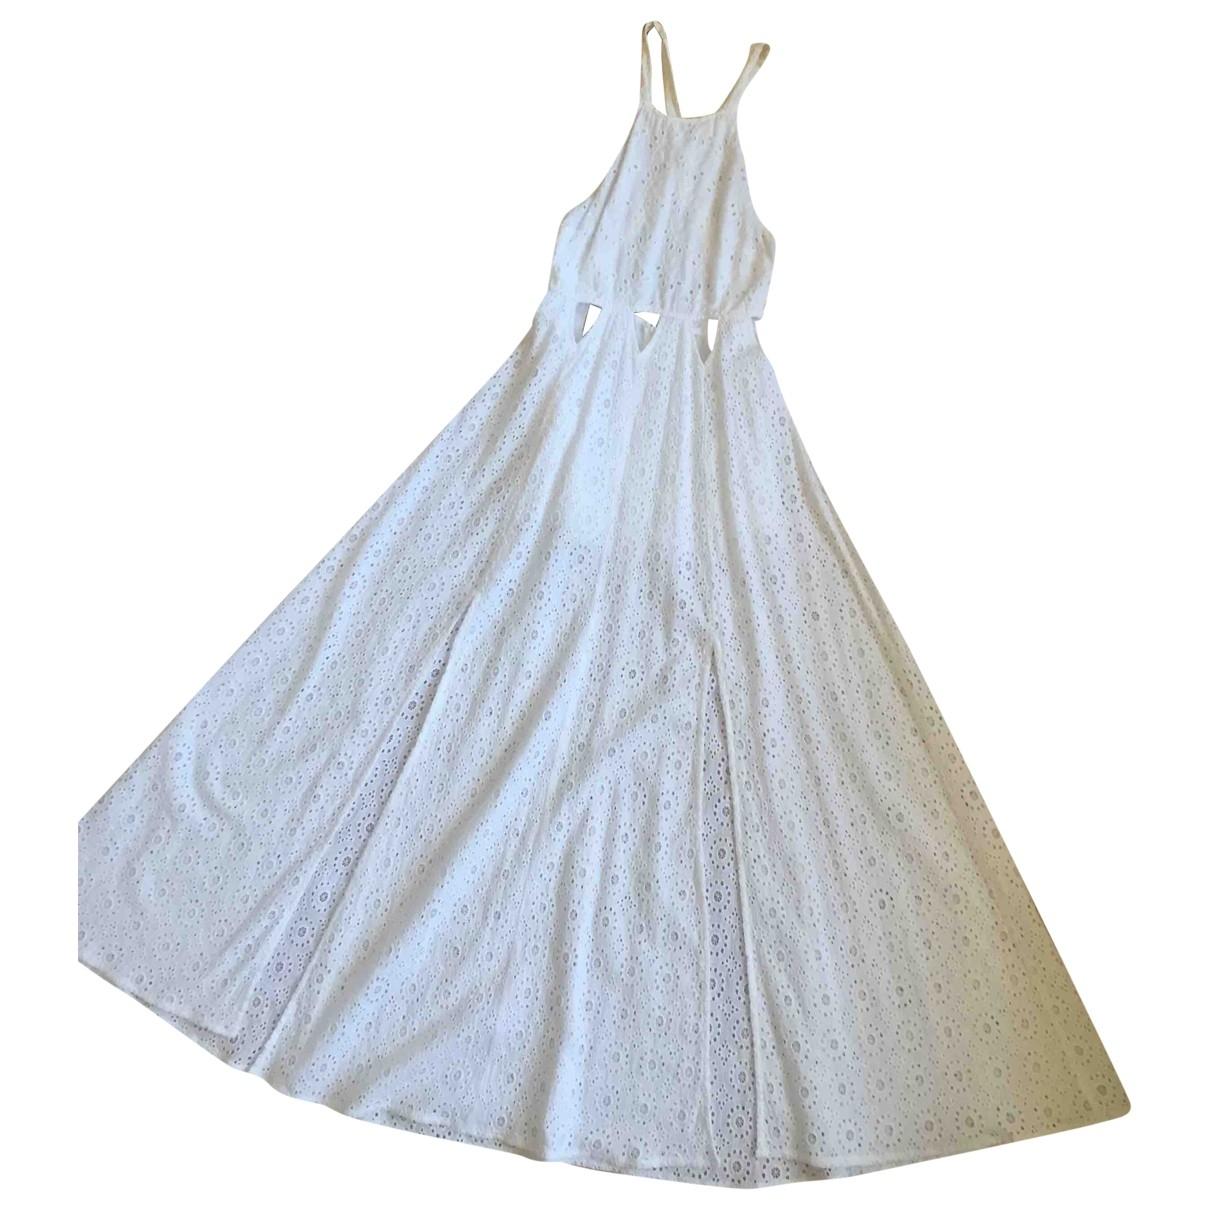 Tularosa \N White Cotton dress for Women XS International